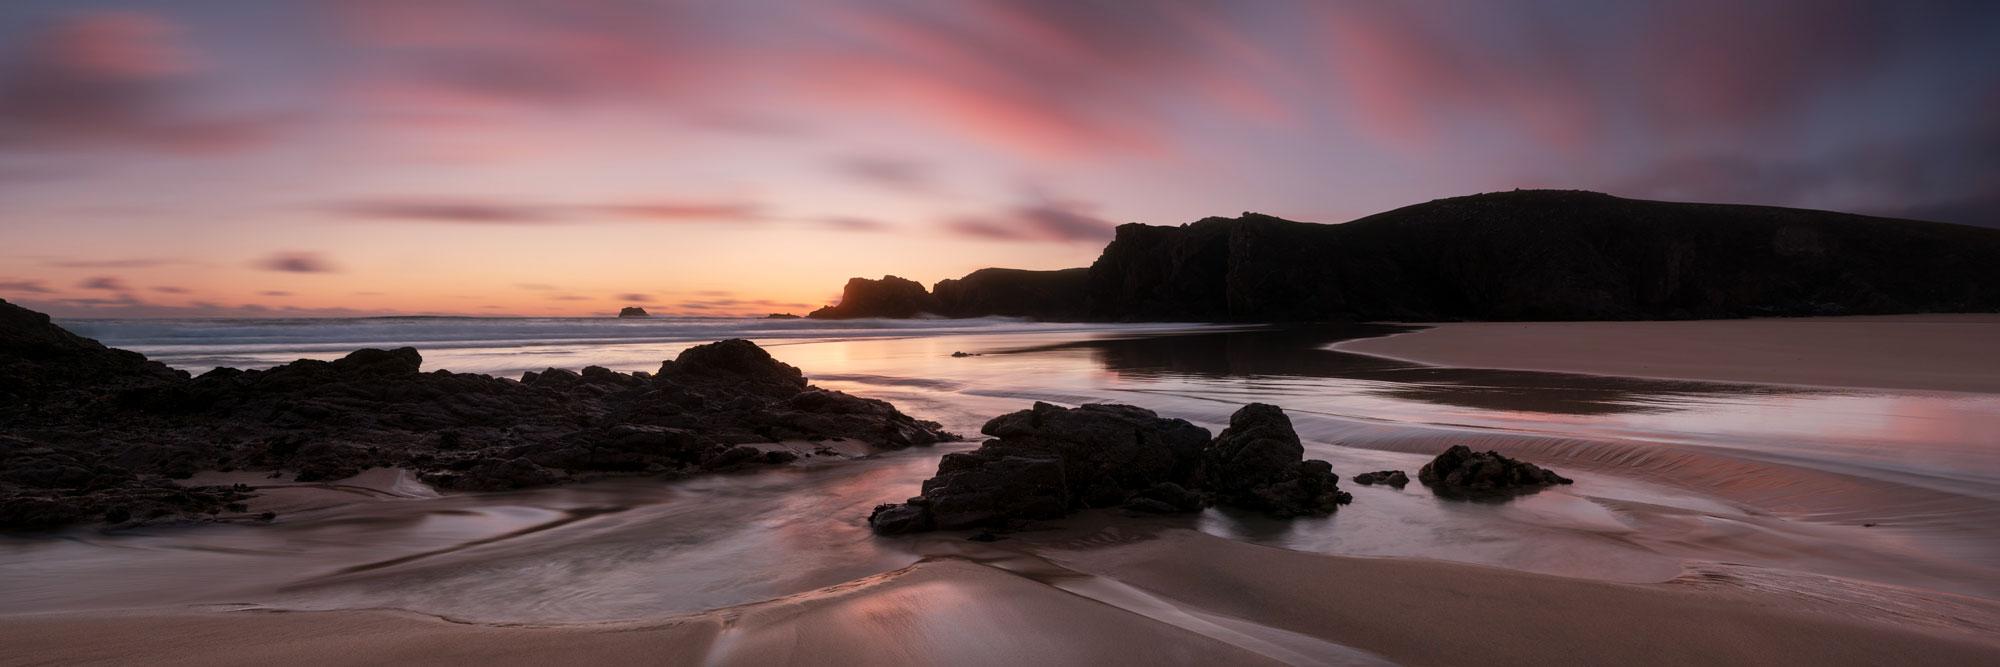 Mangustadh beach at sunset Scotland